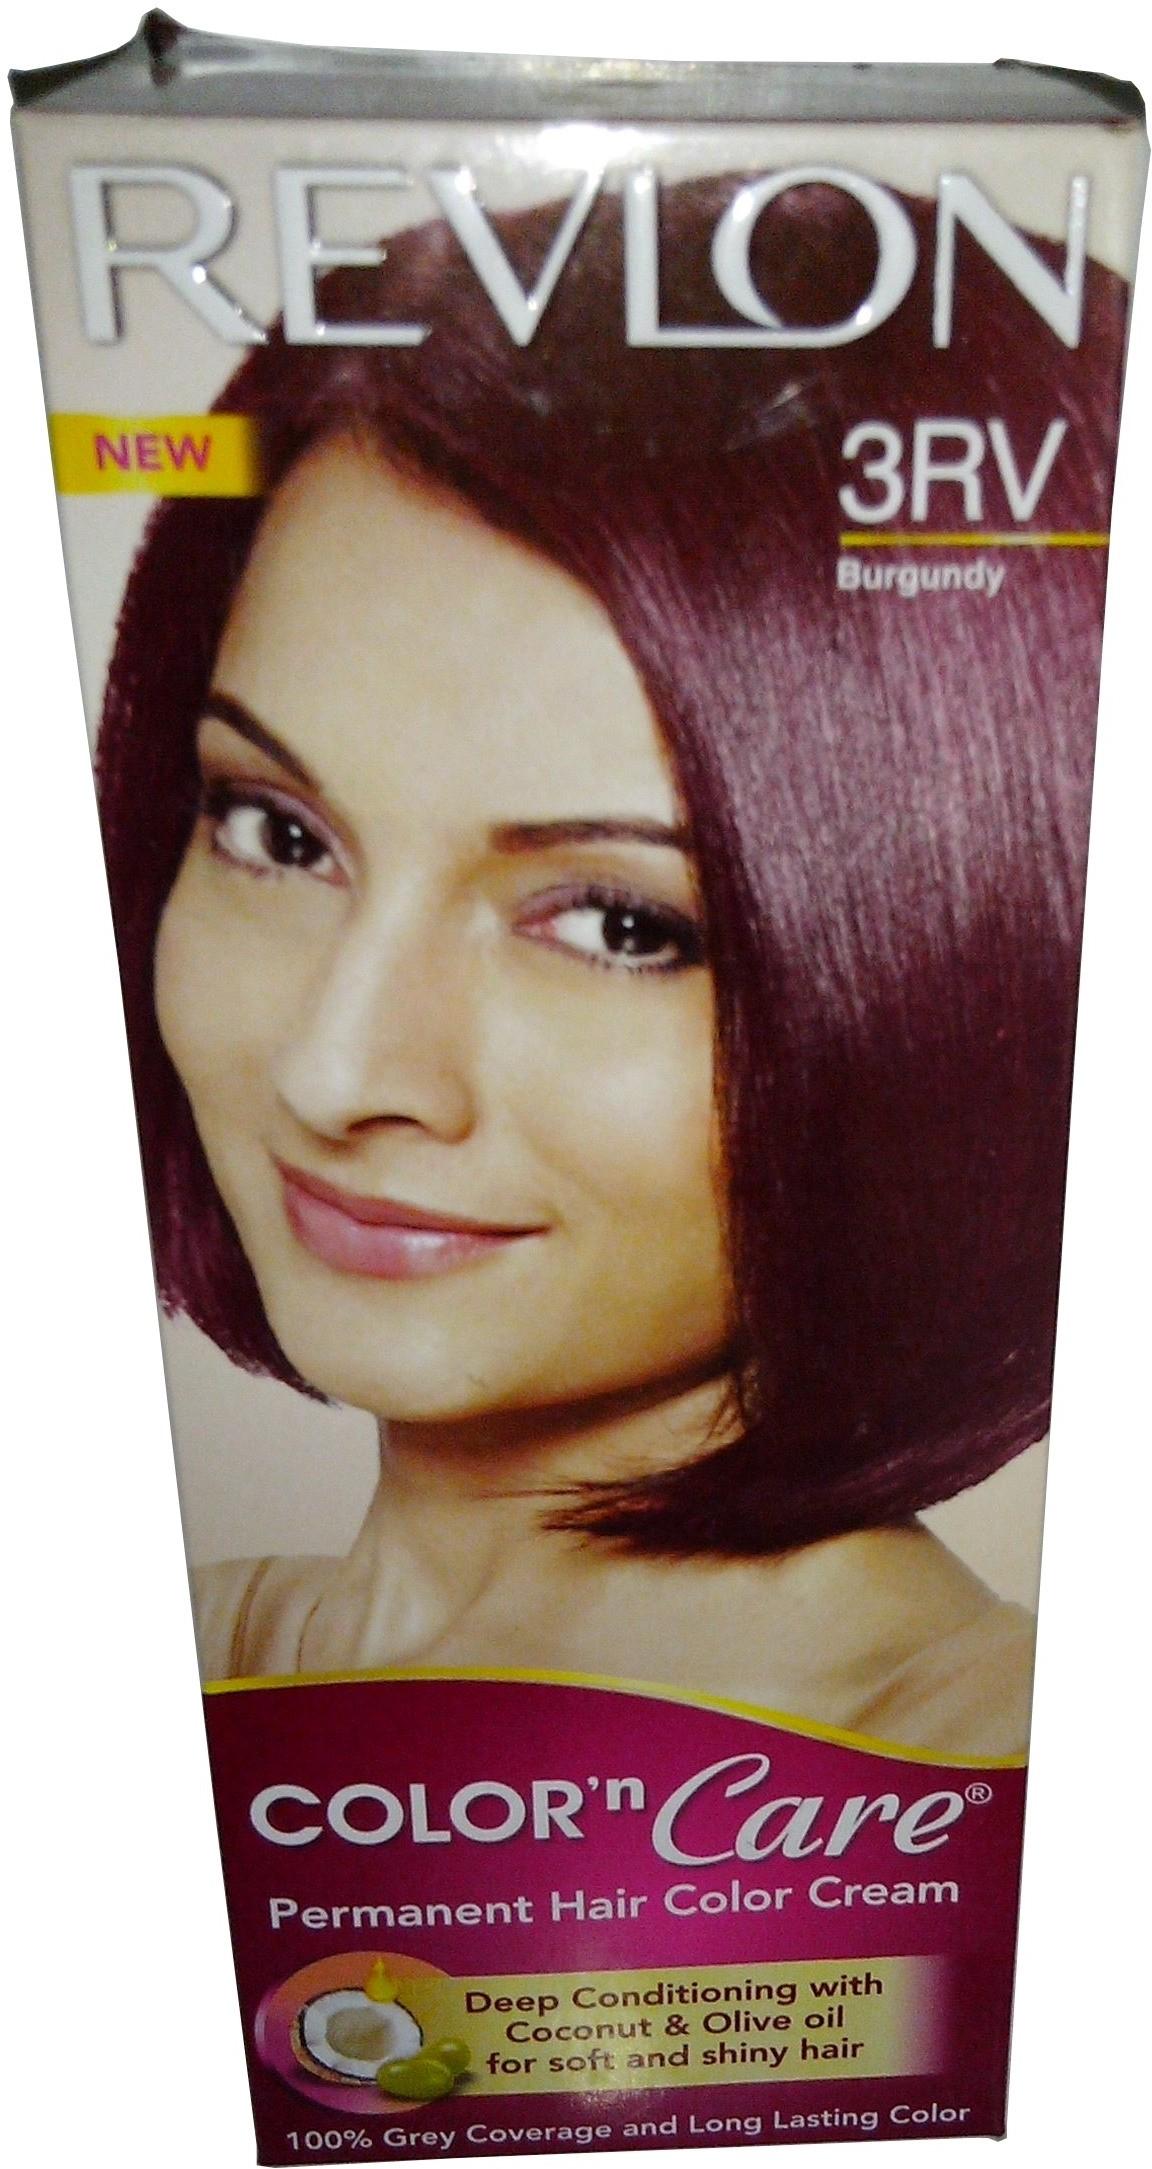 Buy Revlon Color N Care Permanent Hair Color Cream Hair Color 3rv